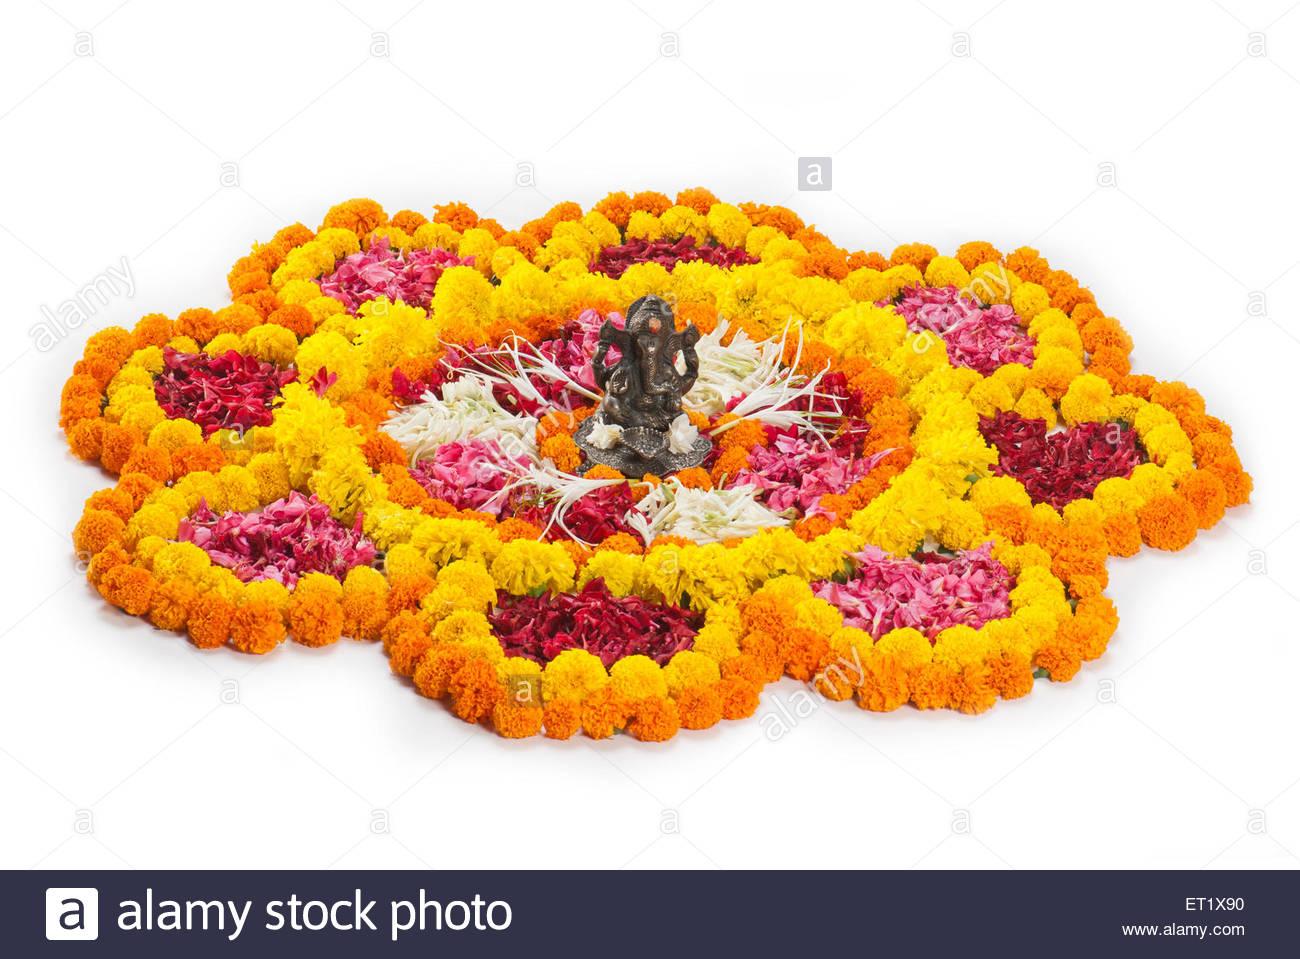 Lord Ganesha Idol On Flowers Rangoli Design On White Background In